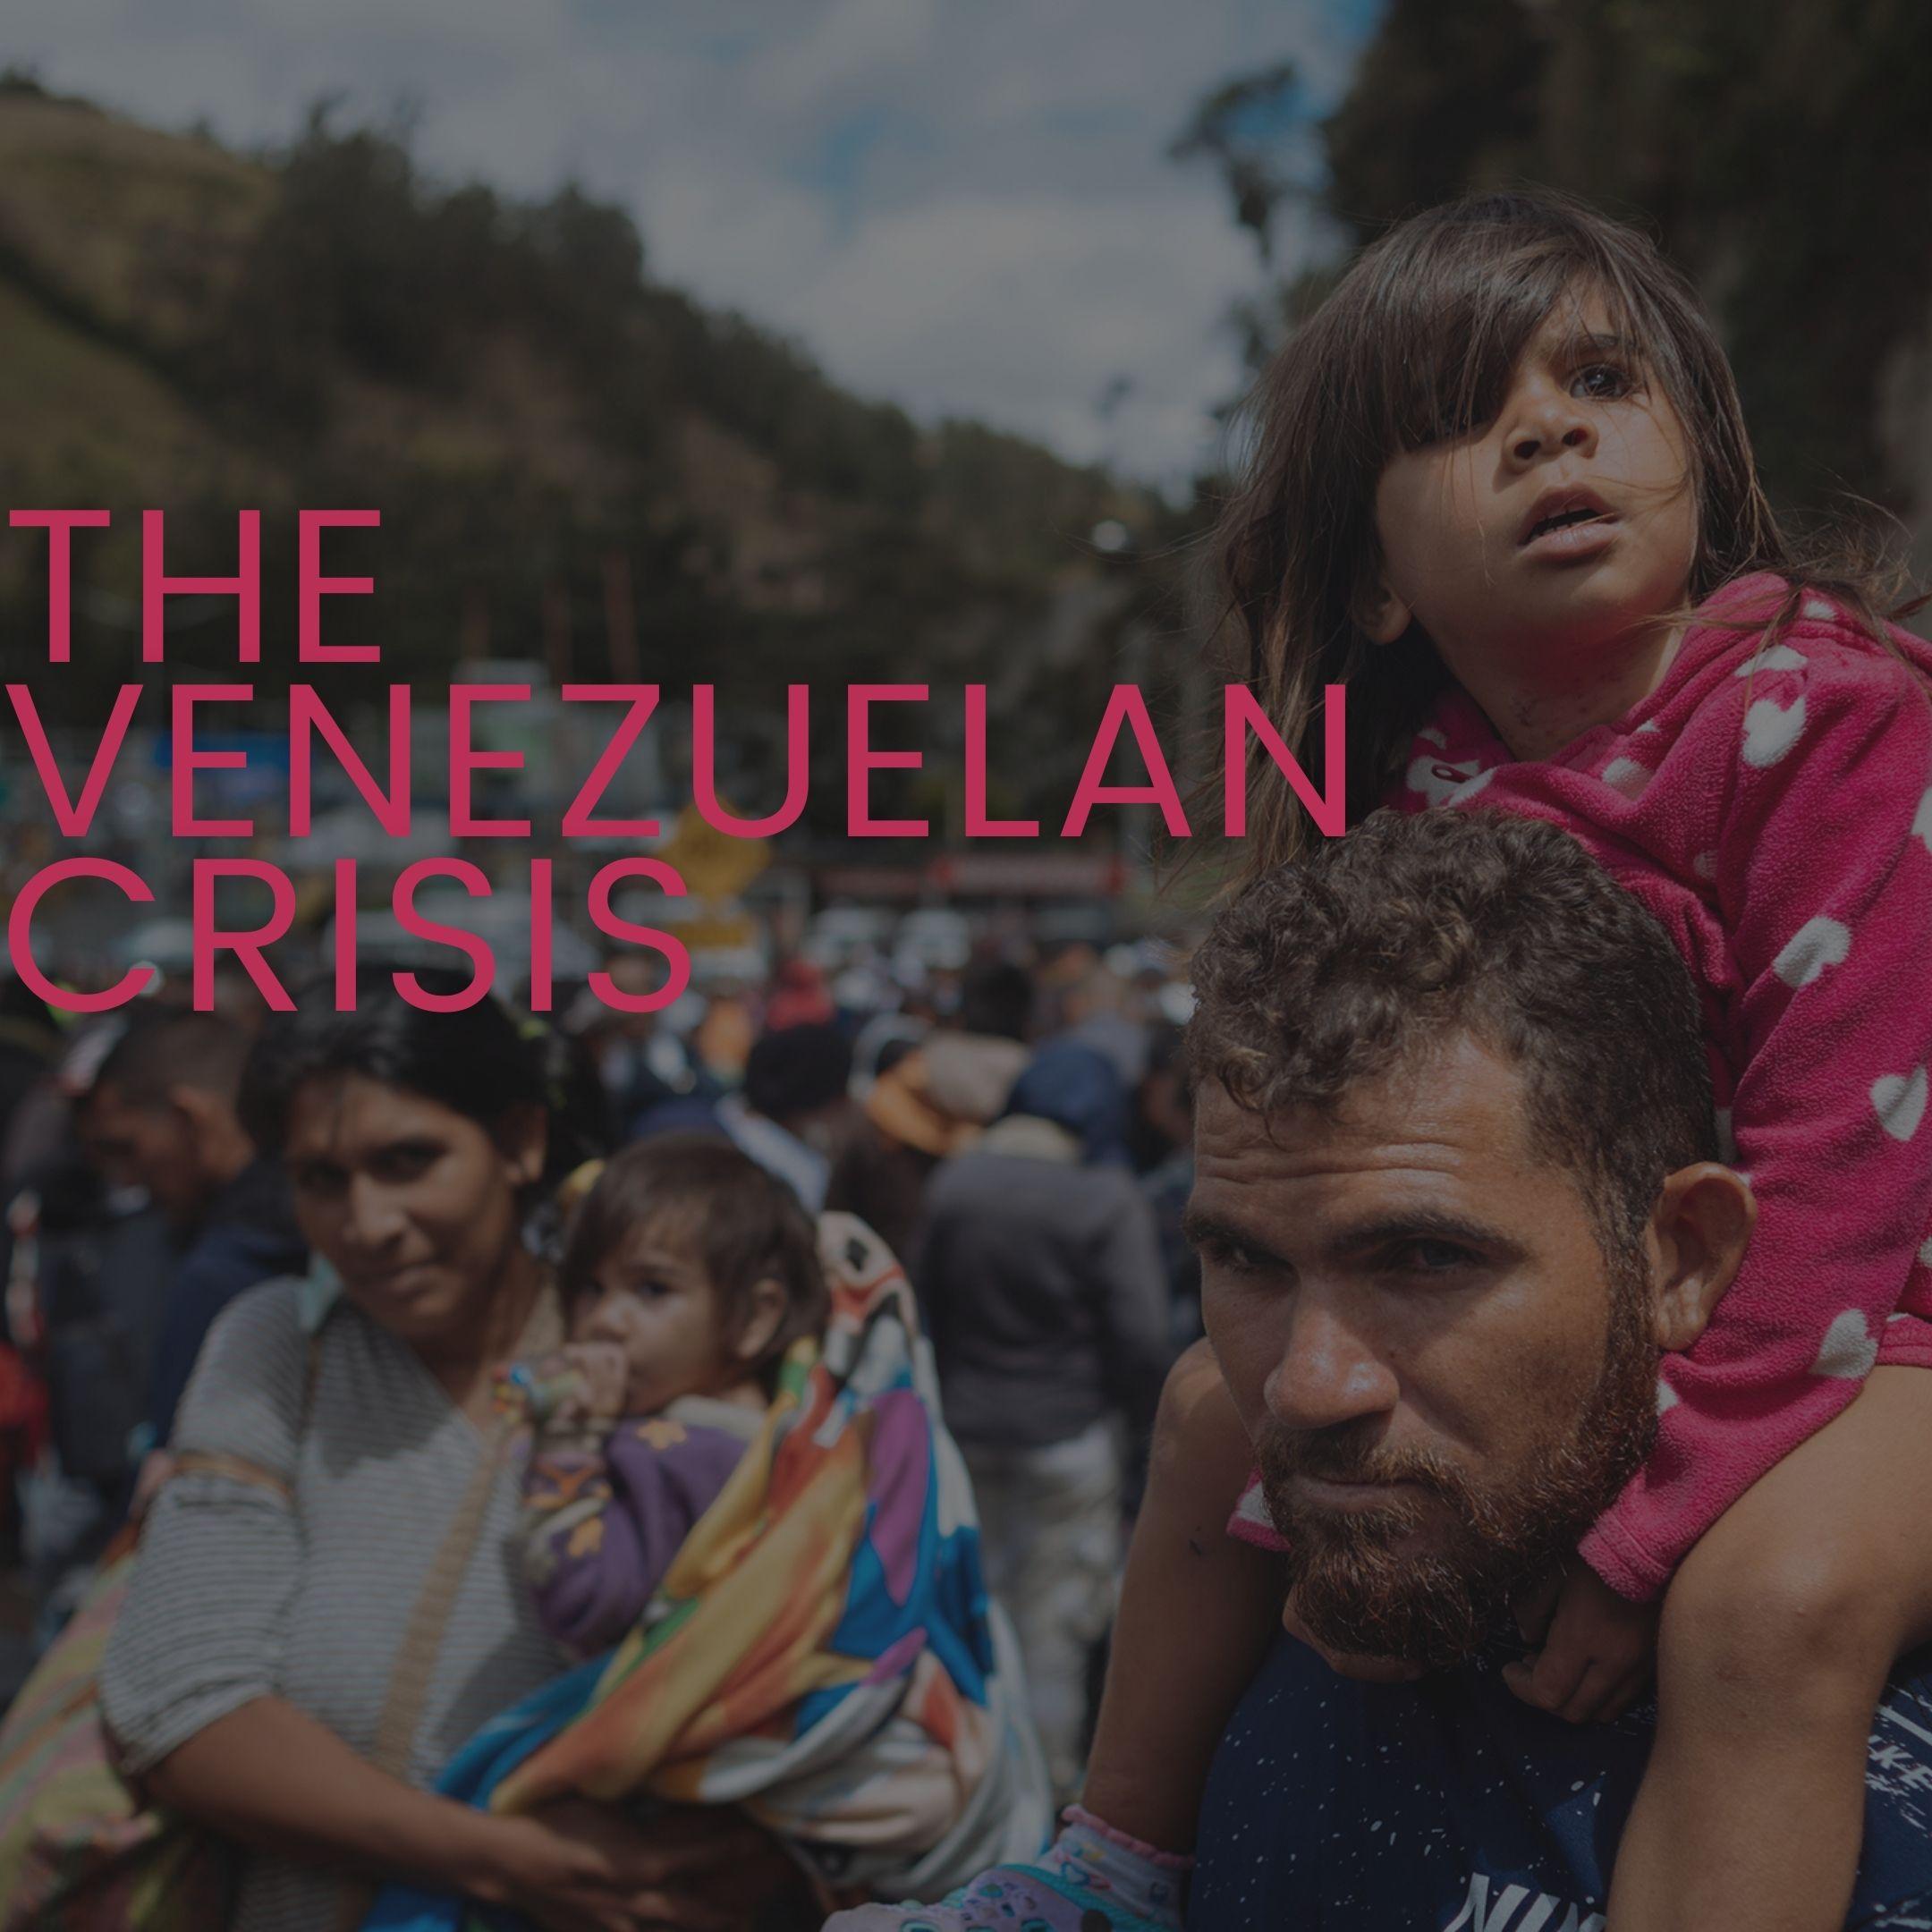 Fundraiser for Venezuelan Humanitarian Crisis